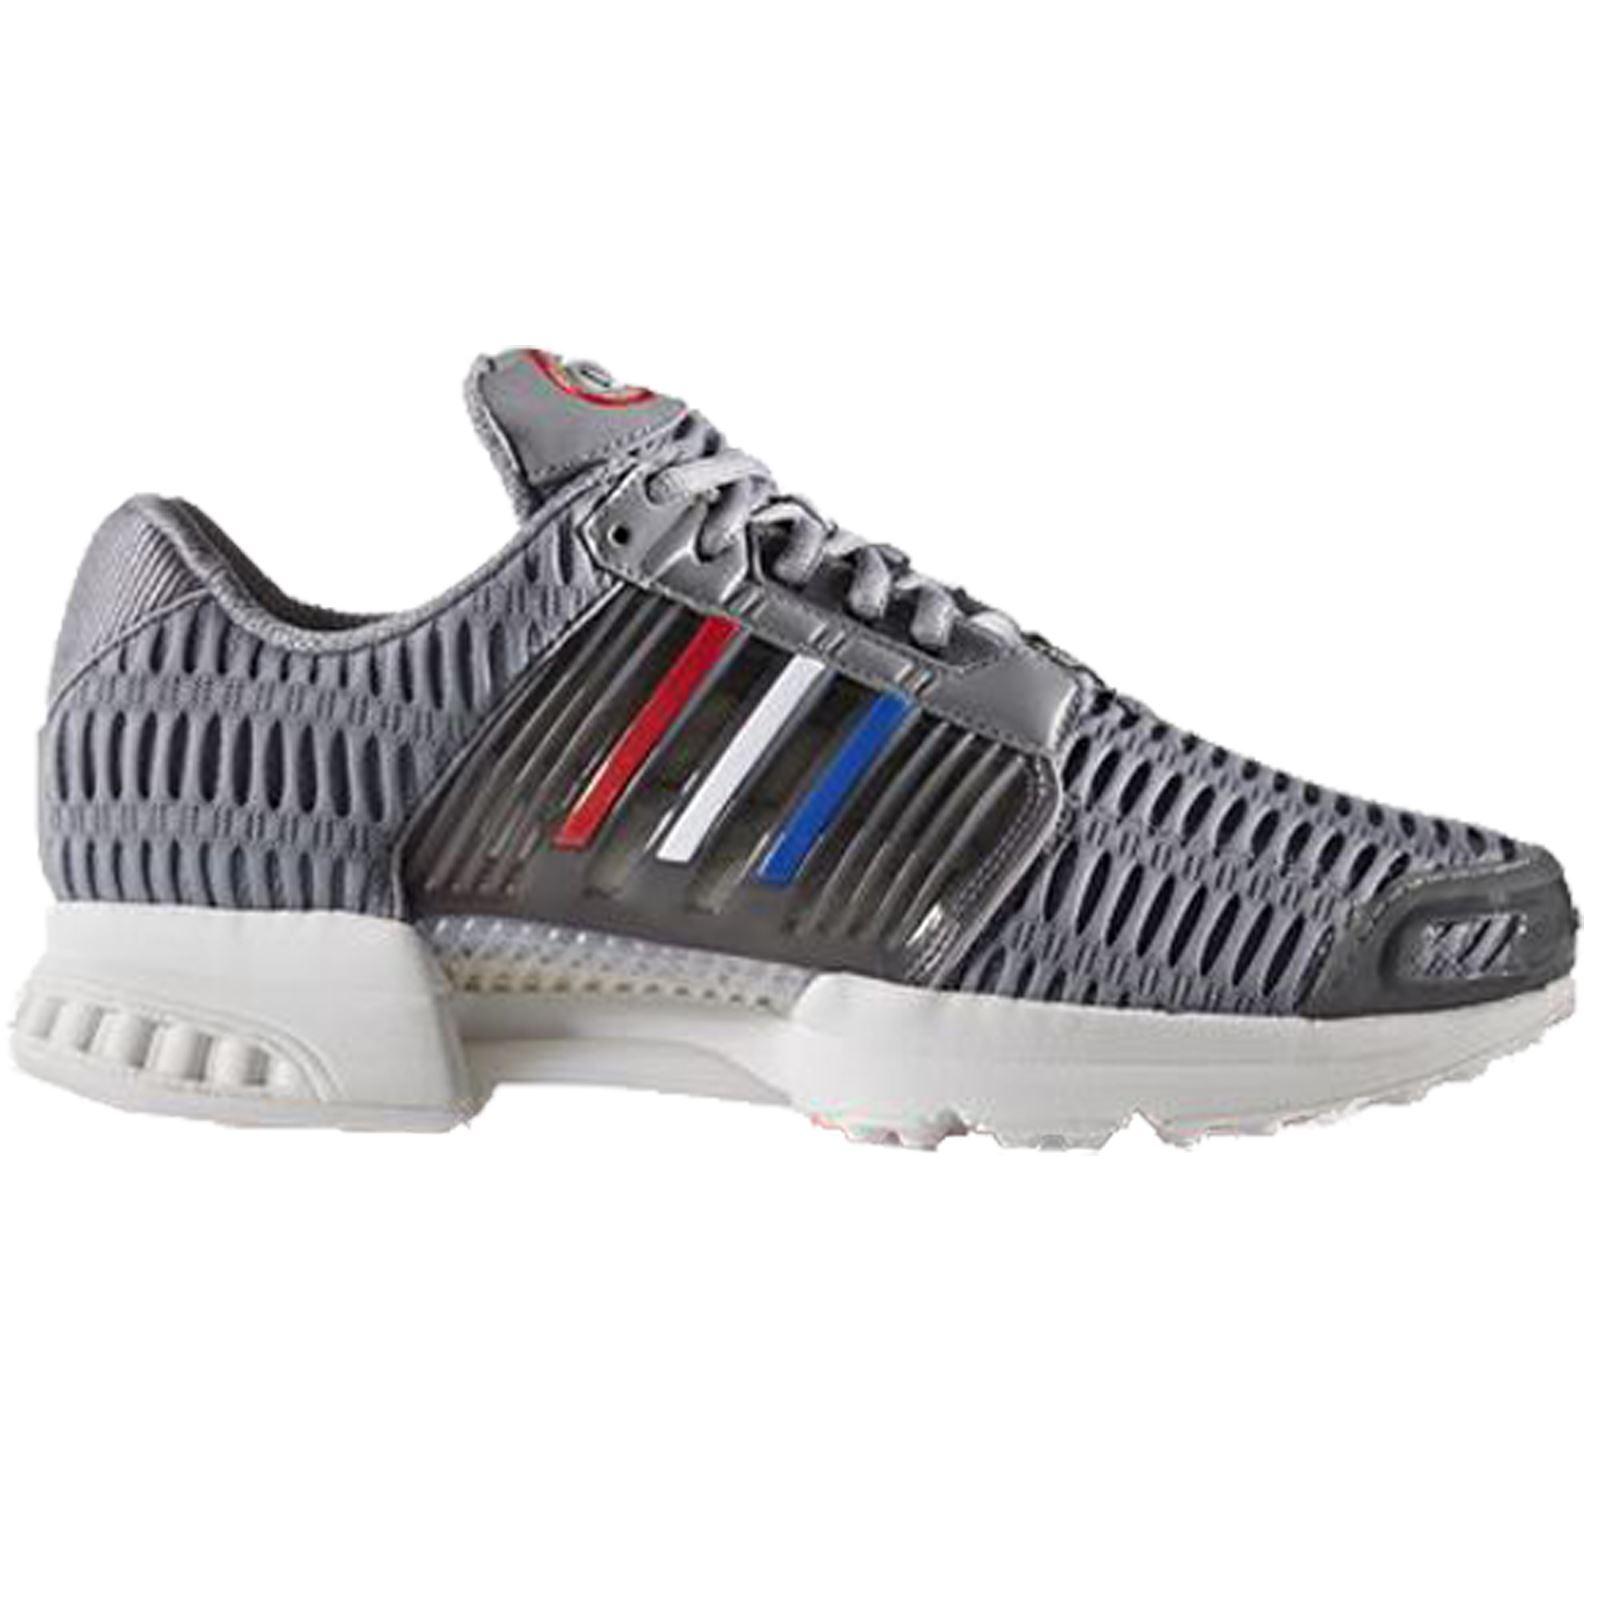 Adidas Climacool 1 S76528 Mens TrainersOriginalsto 12 Only